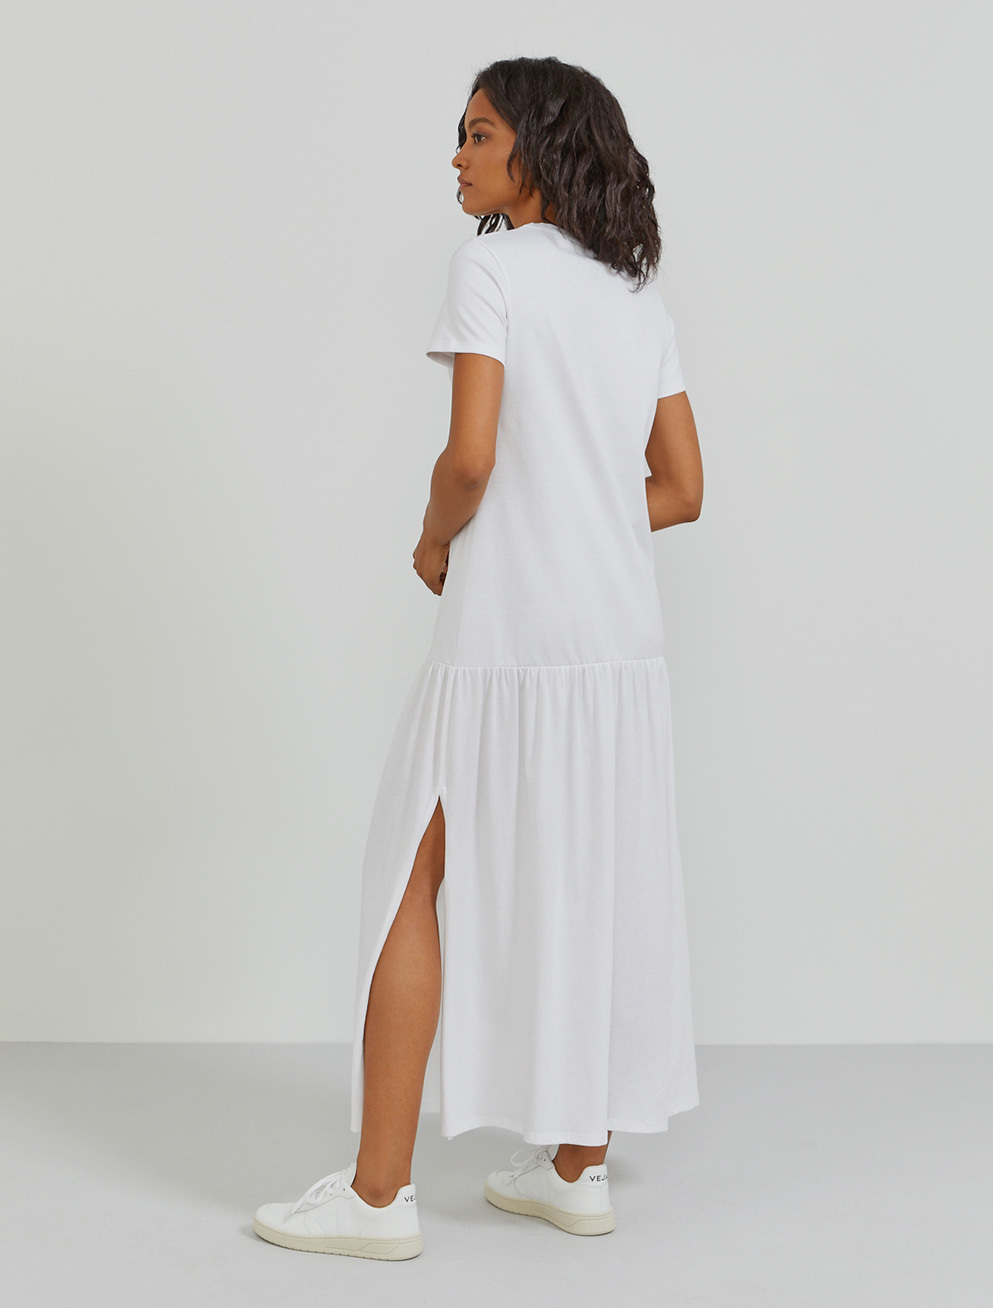 Organic cotton T-shirt maxi dress